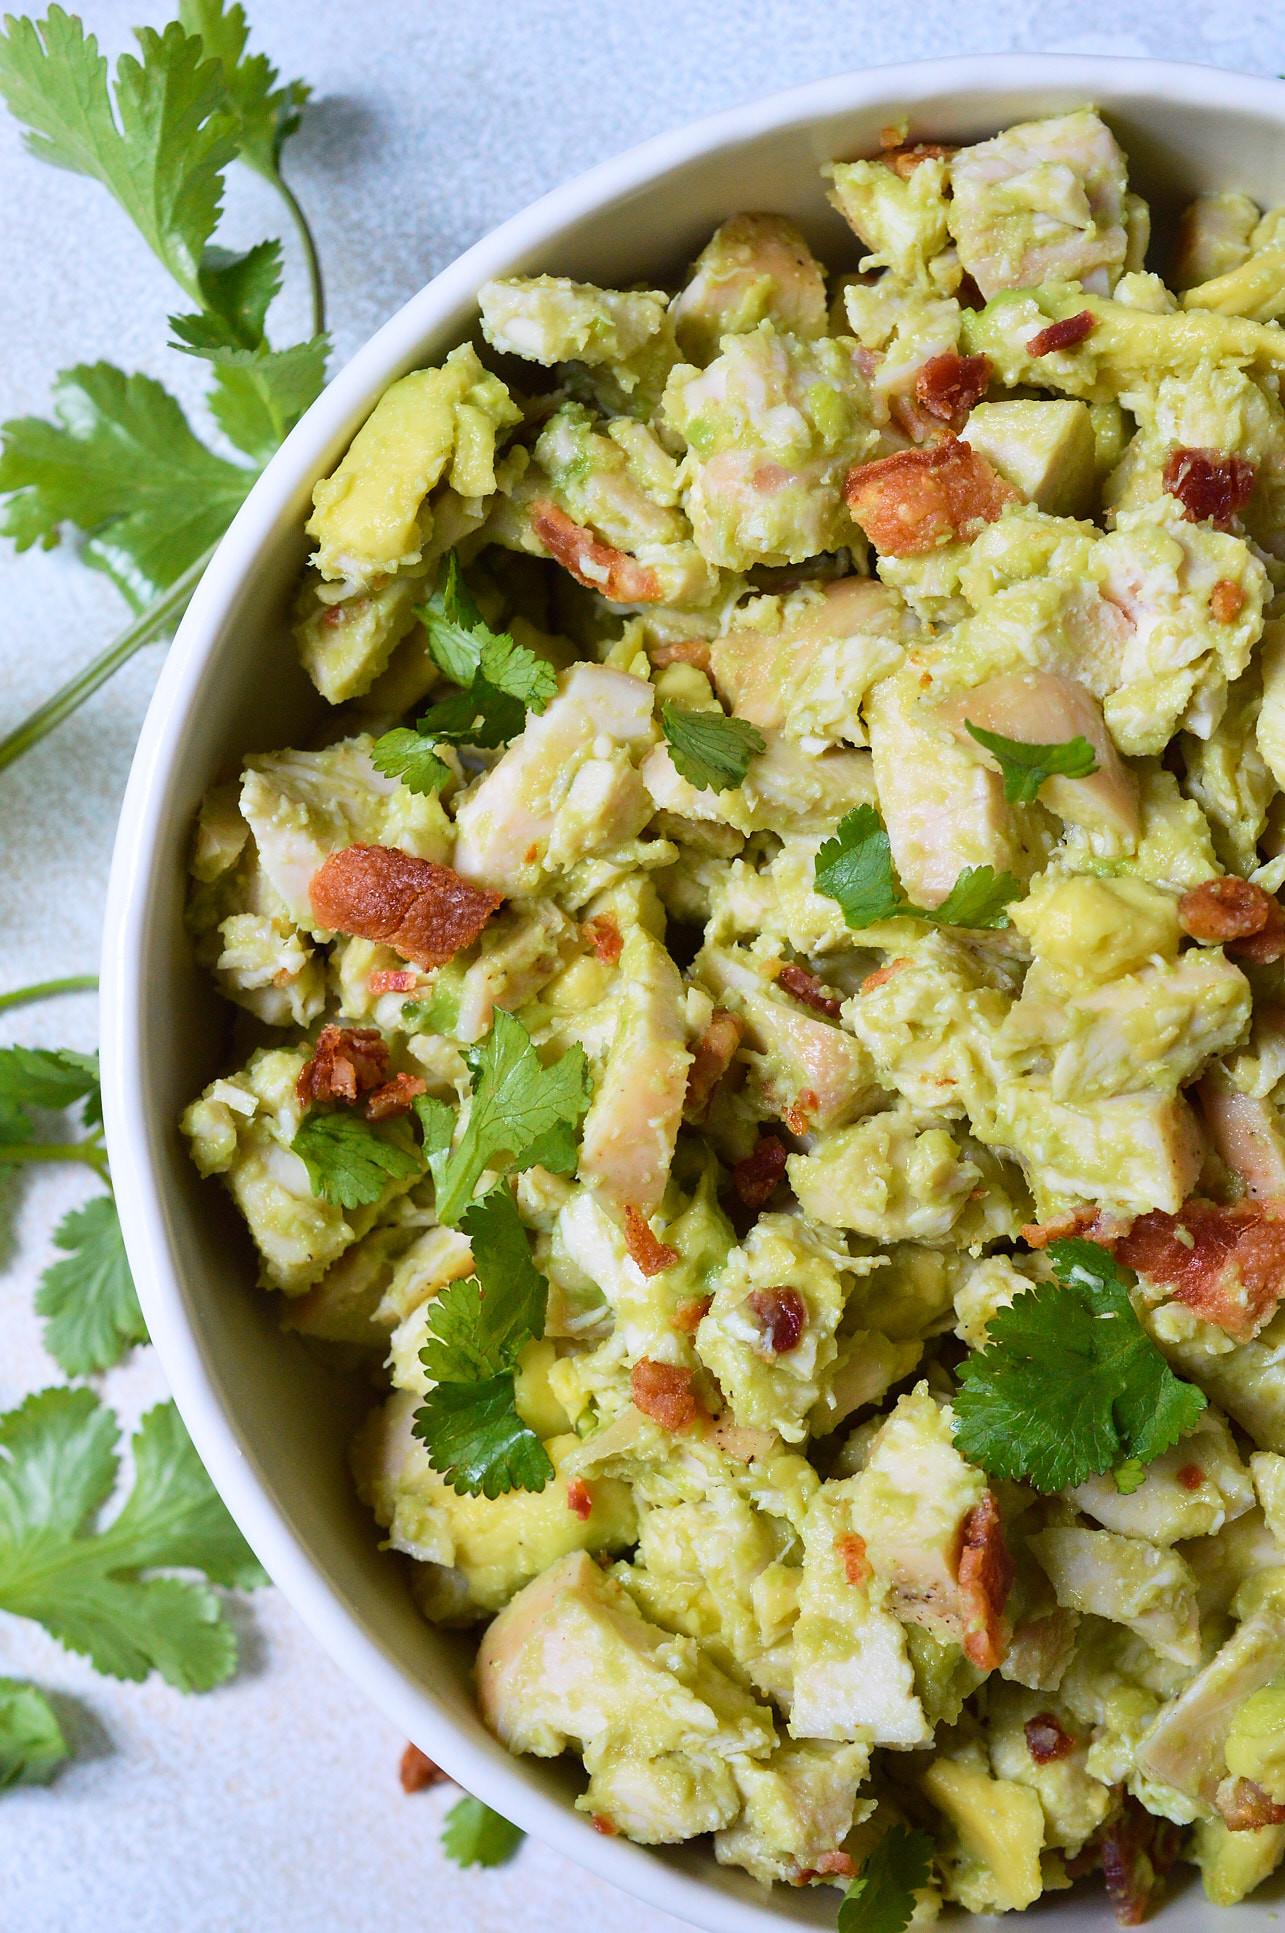 Healthy Chicken Salad Recipe No Mayo  Bacon Avocado Chicken Salad Whole30 Recipe WonkyWonderful